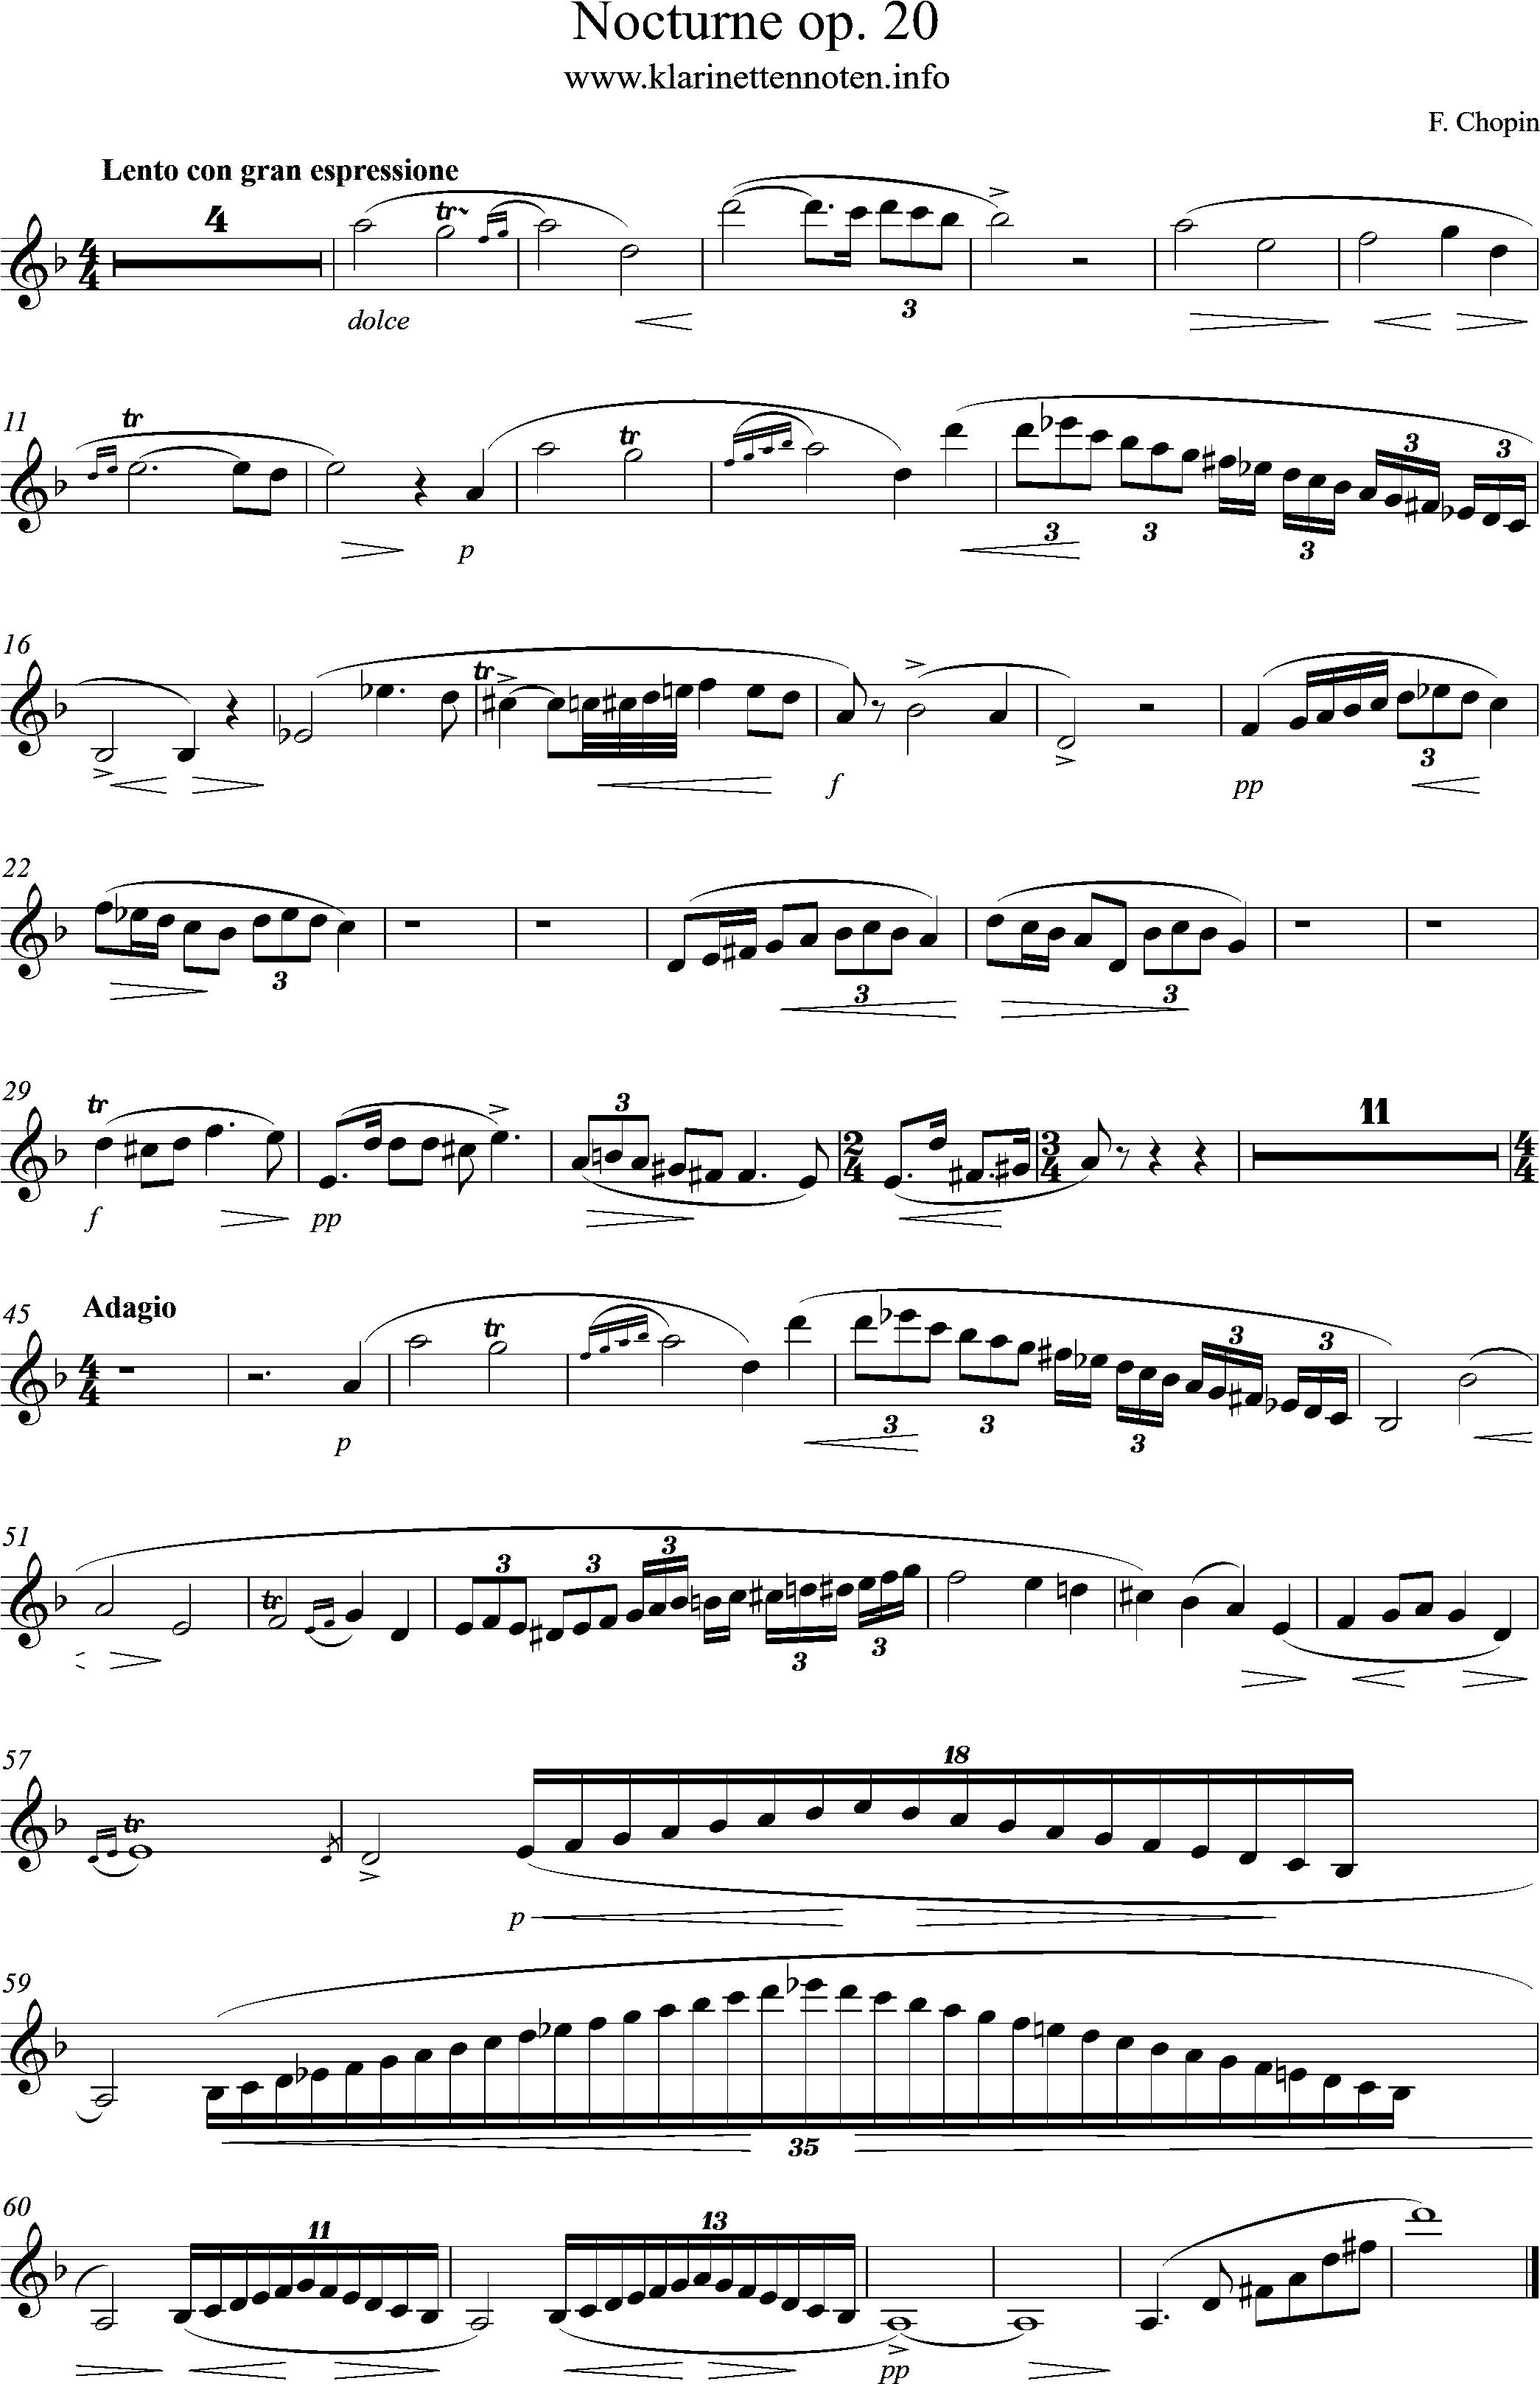 Nocturne - op20 - dm